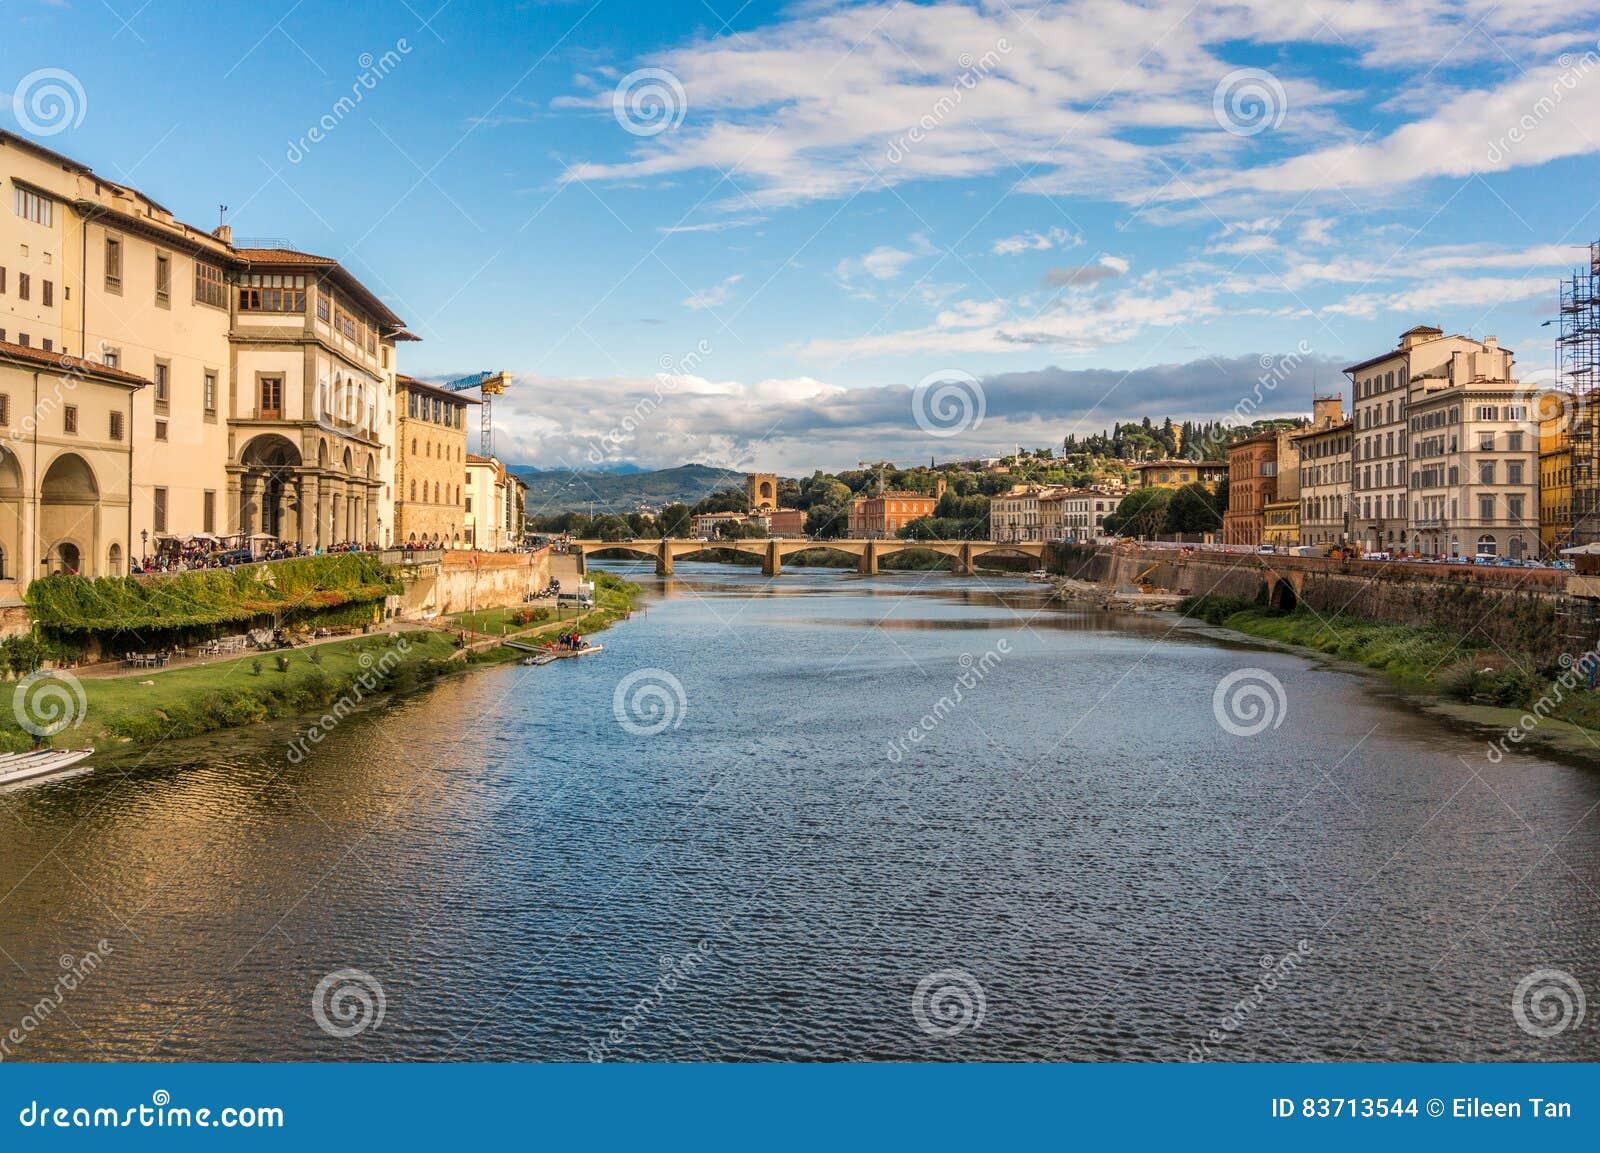 Bridge In Florene, Italy Stock Photo